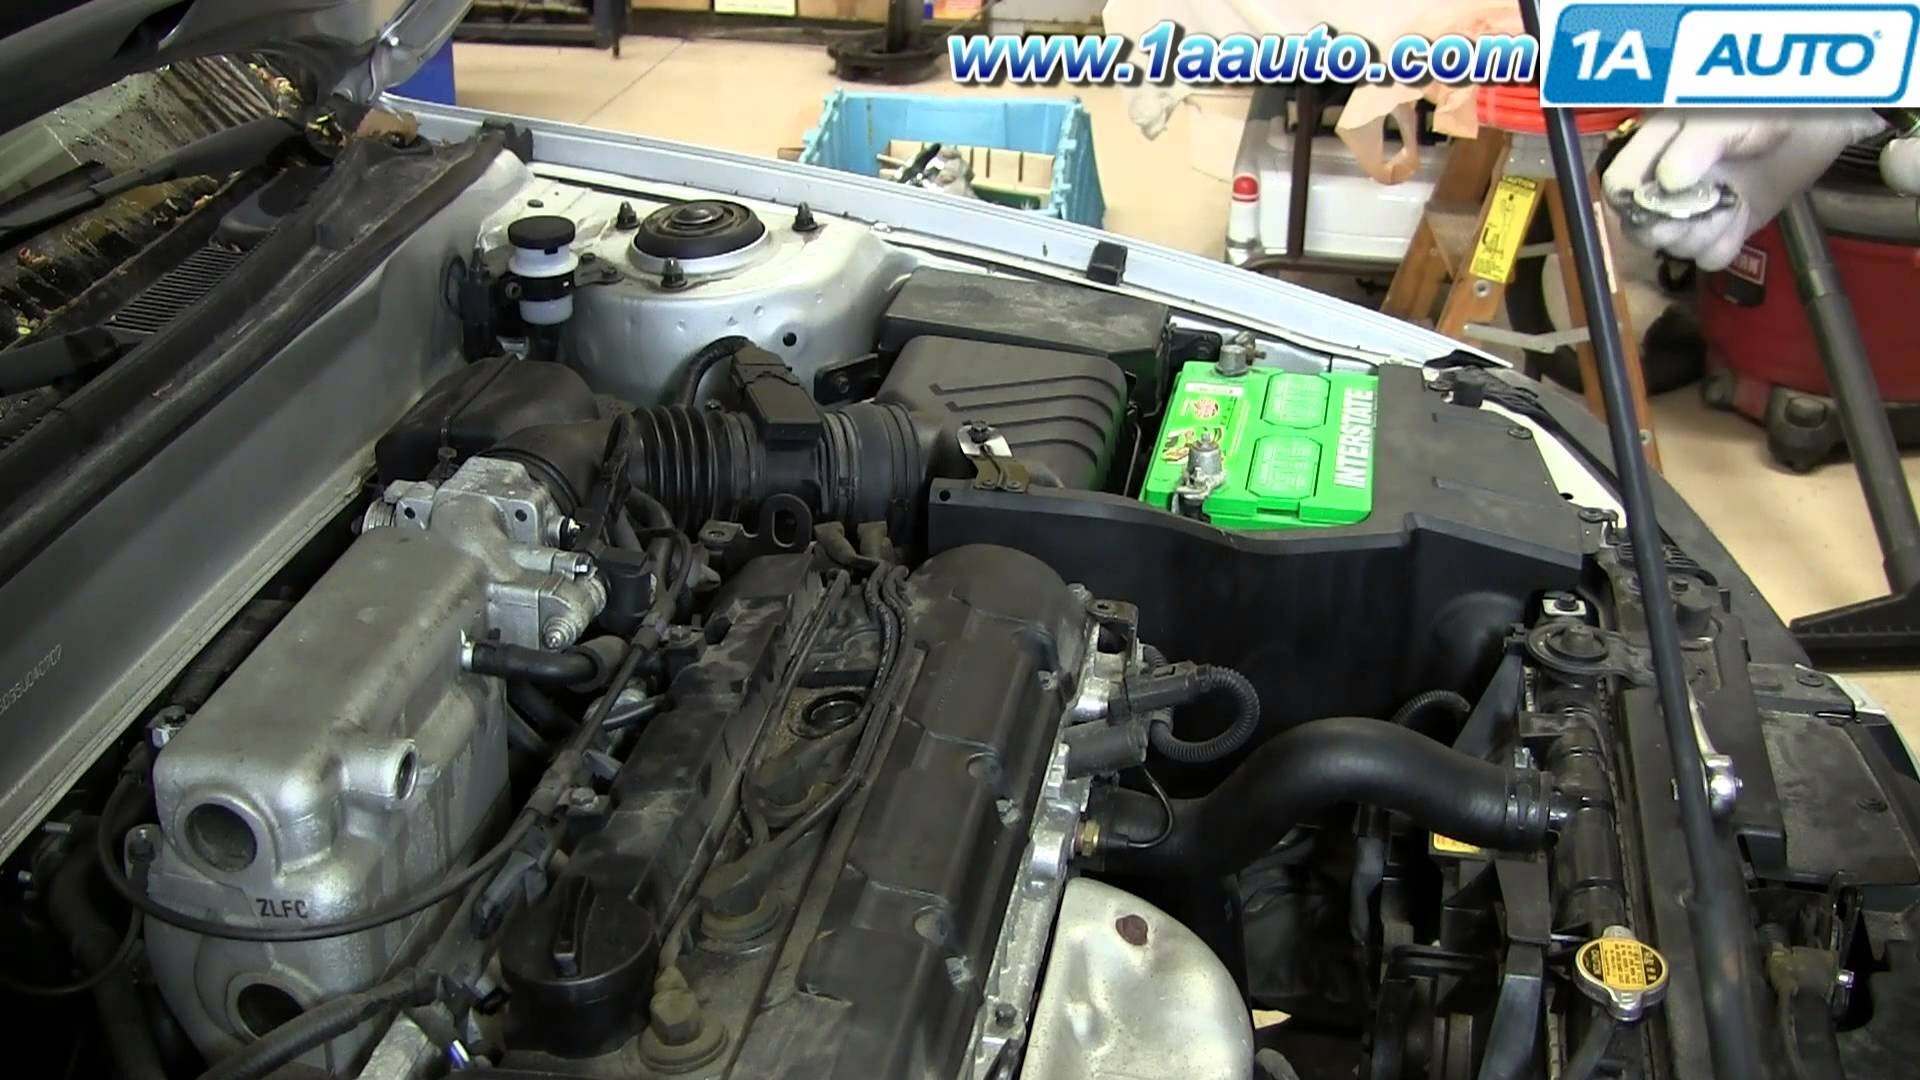 2002 hyundai elantra engine diagram telstra home phone wiring how to install replace